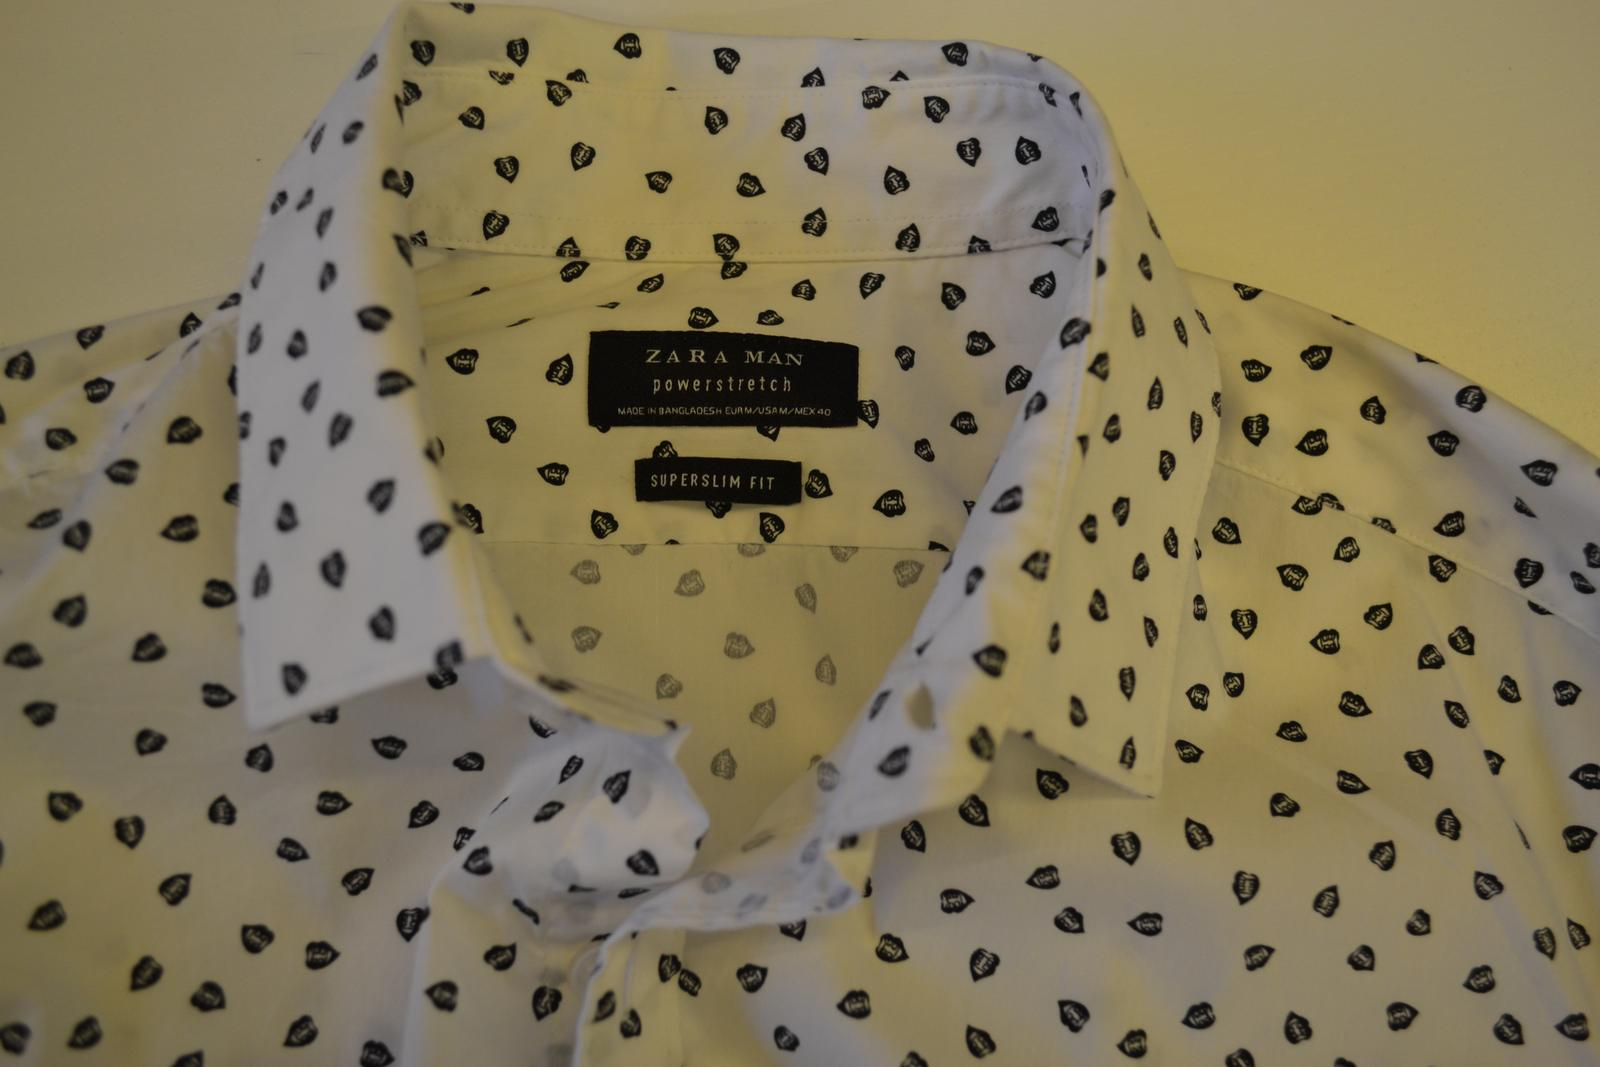 Zara Man košile super slim top stav - Obrázek č. 1